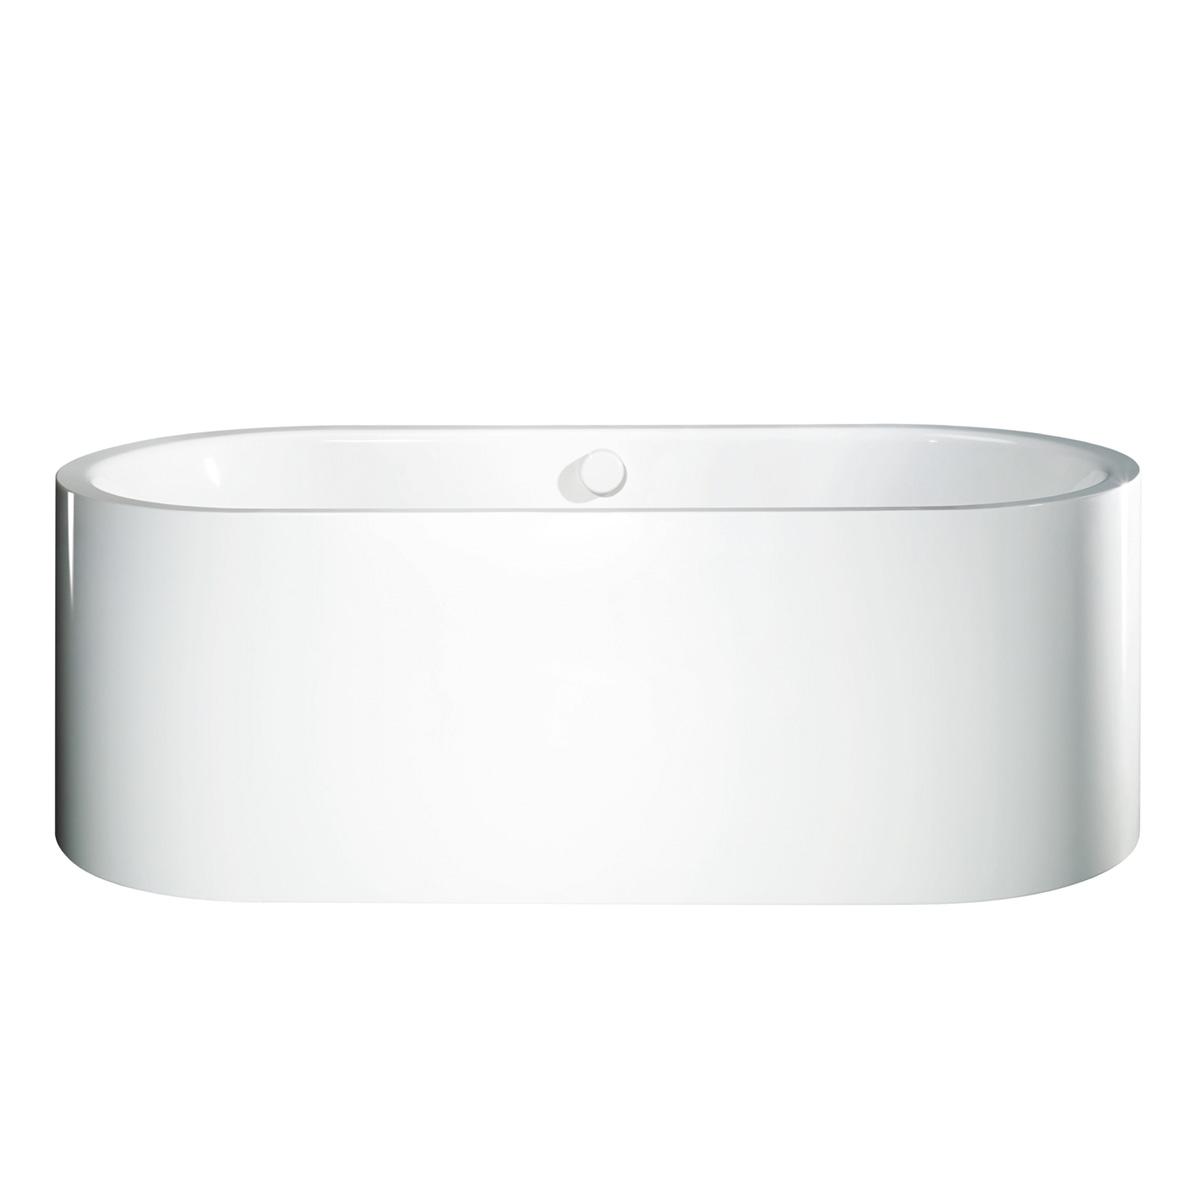 kaldewei meisterst ck centro duo oval 1127 freistehende badewanne l 170 b 75 h 61 cm. Black Bedroom Furniture Sets. Home Design Ideas